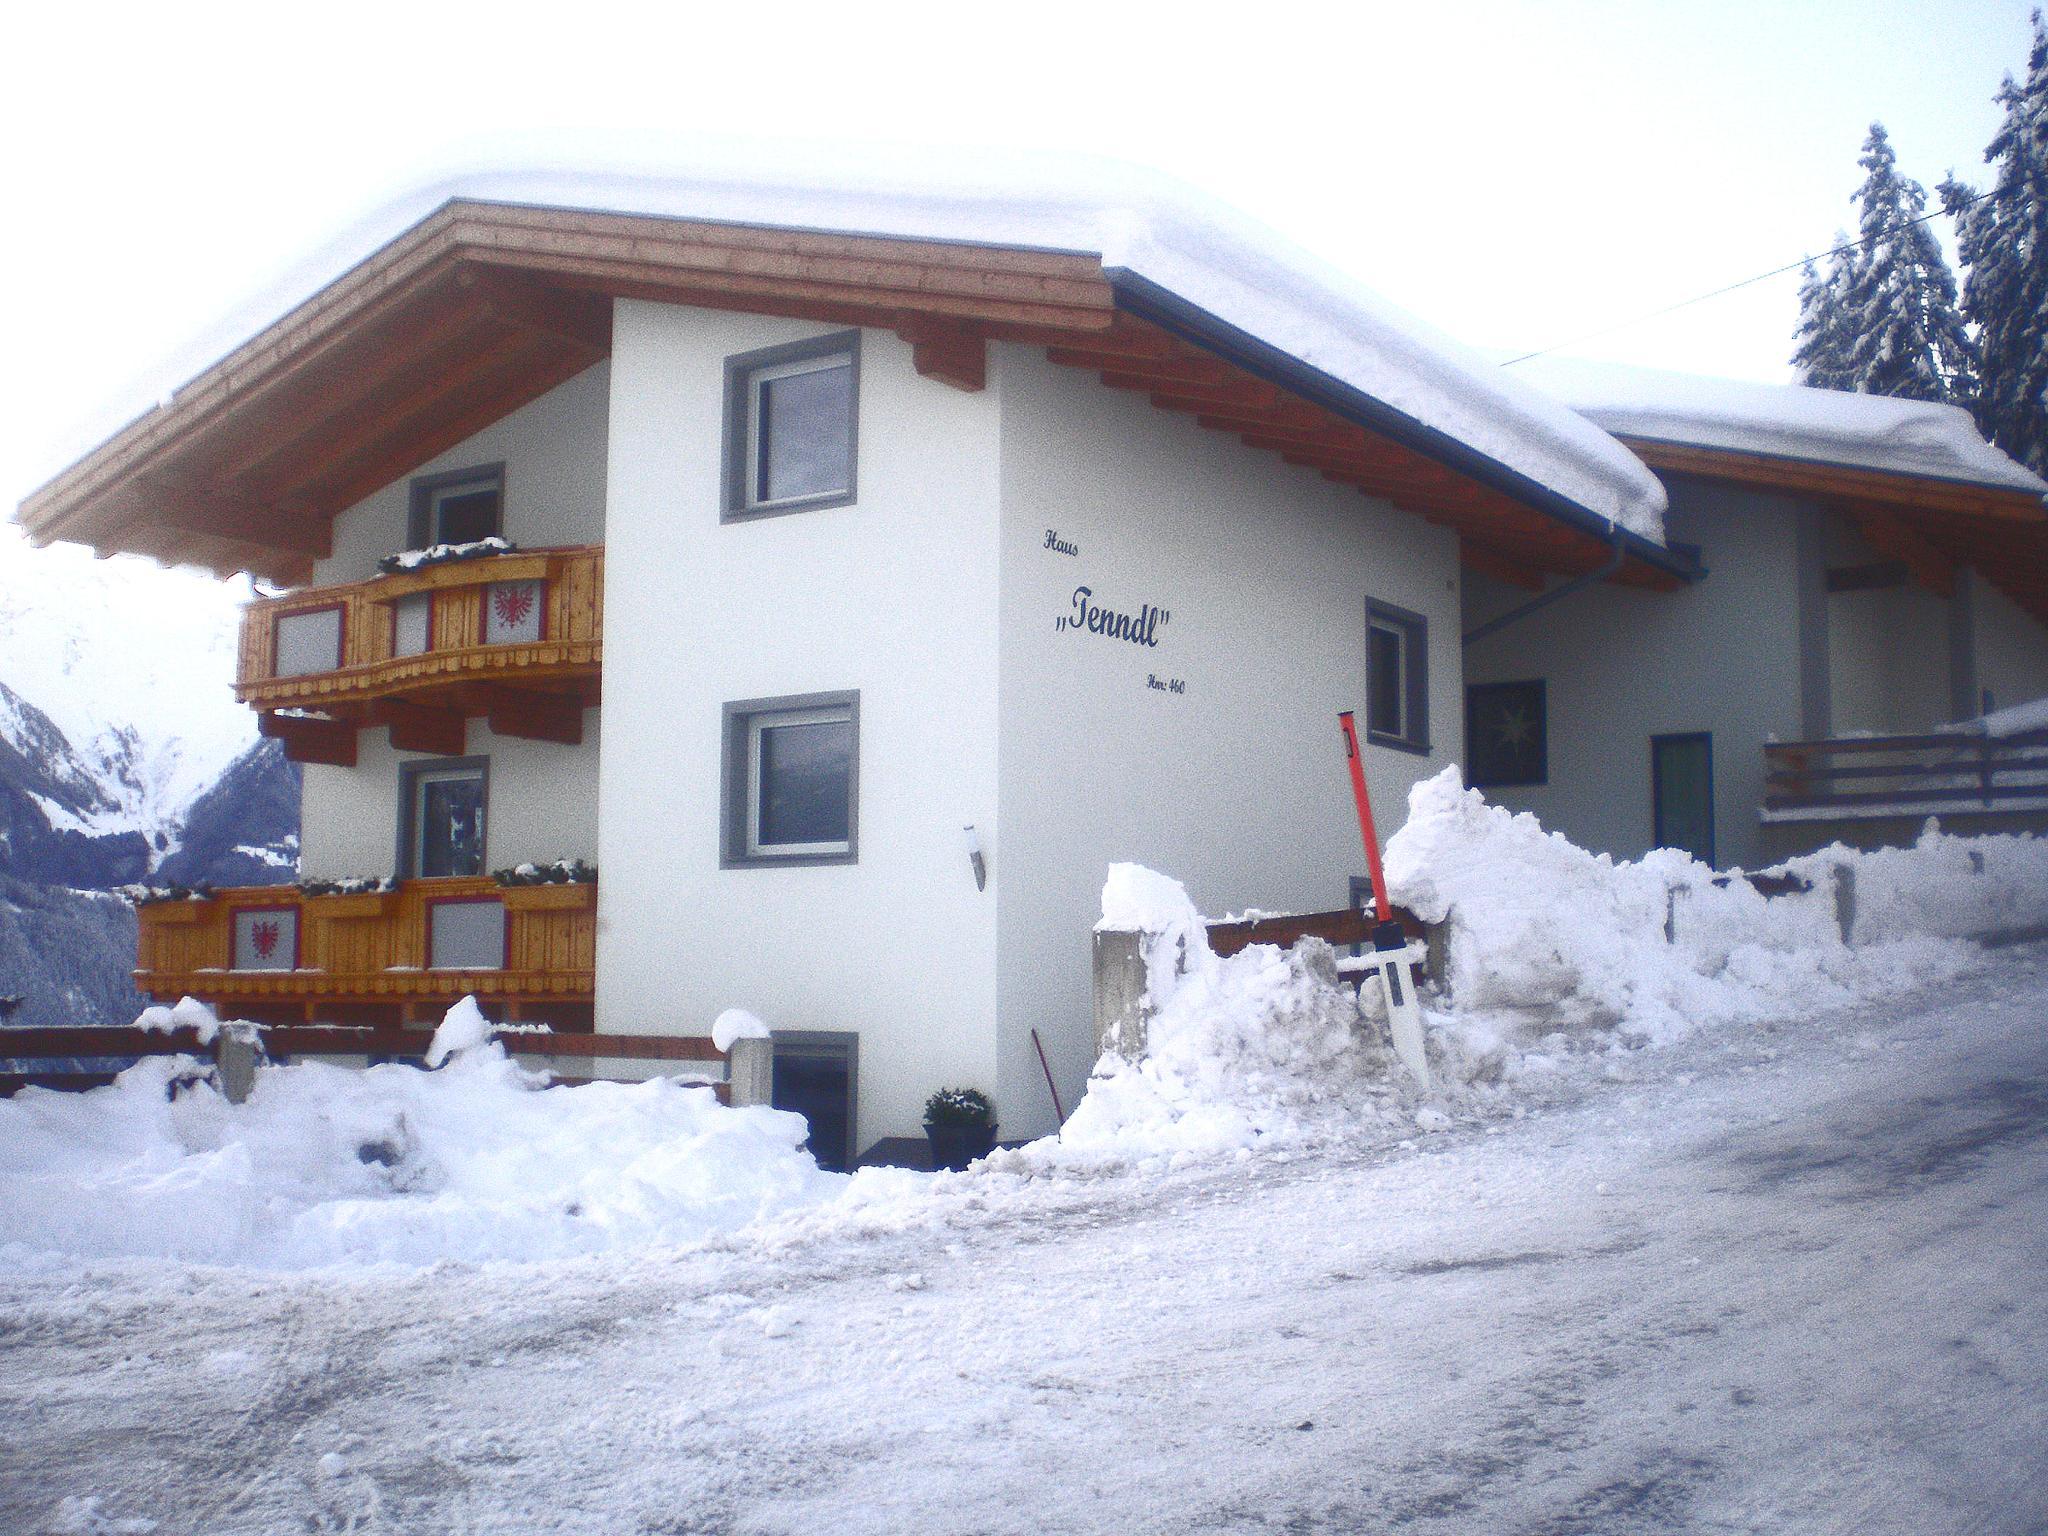 Ferienhaus Tenndl I Tirol